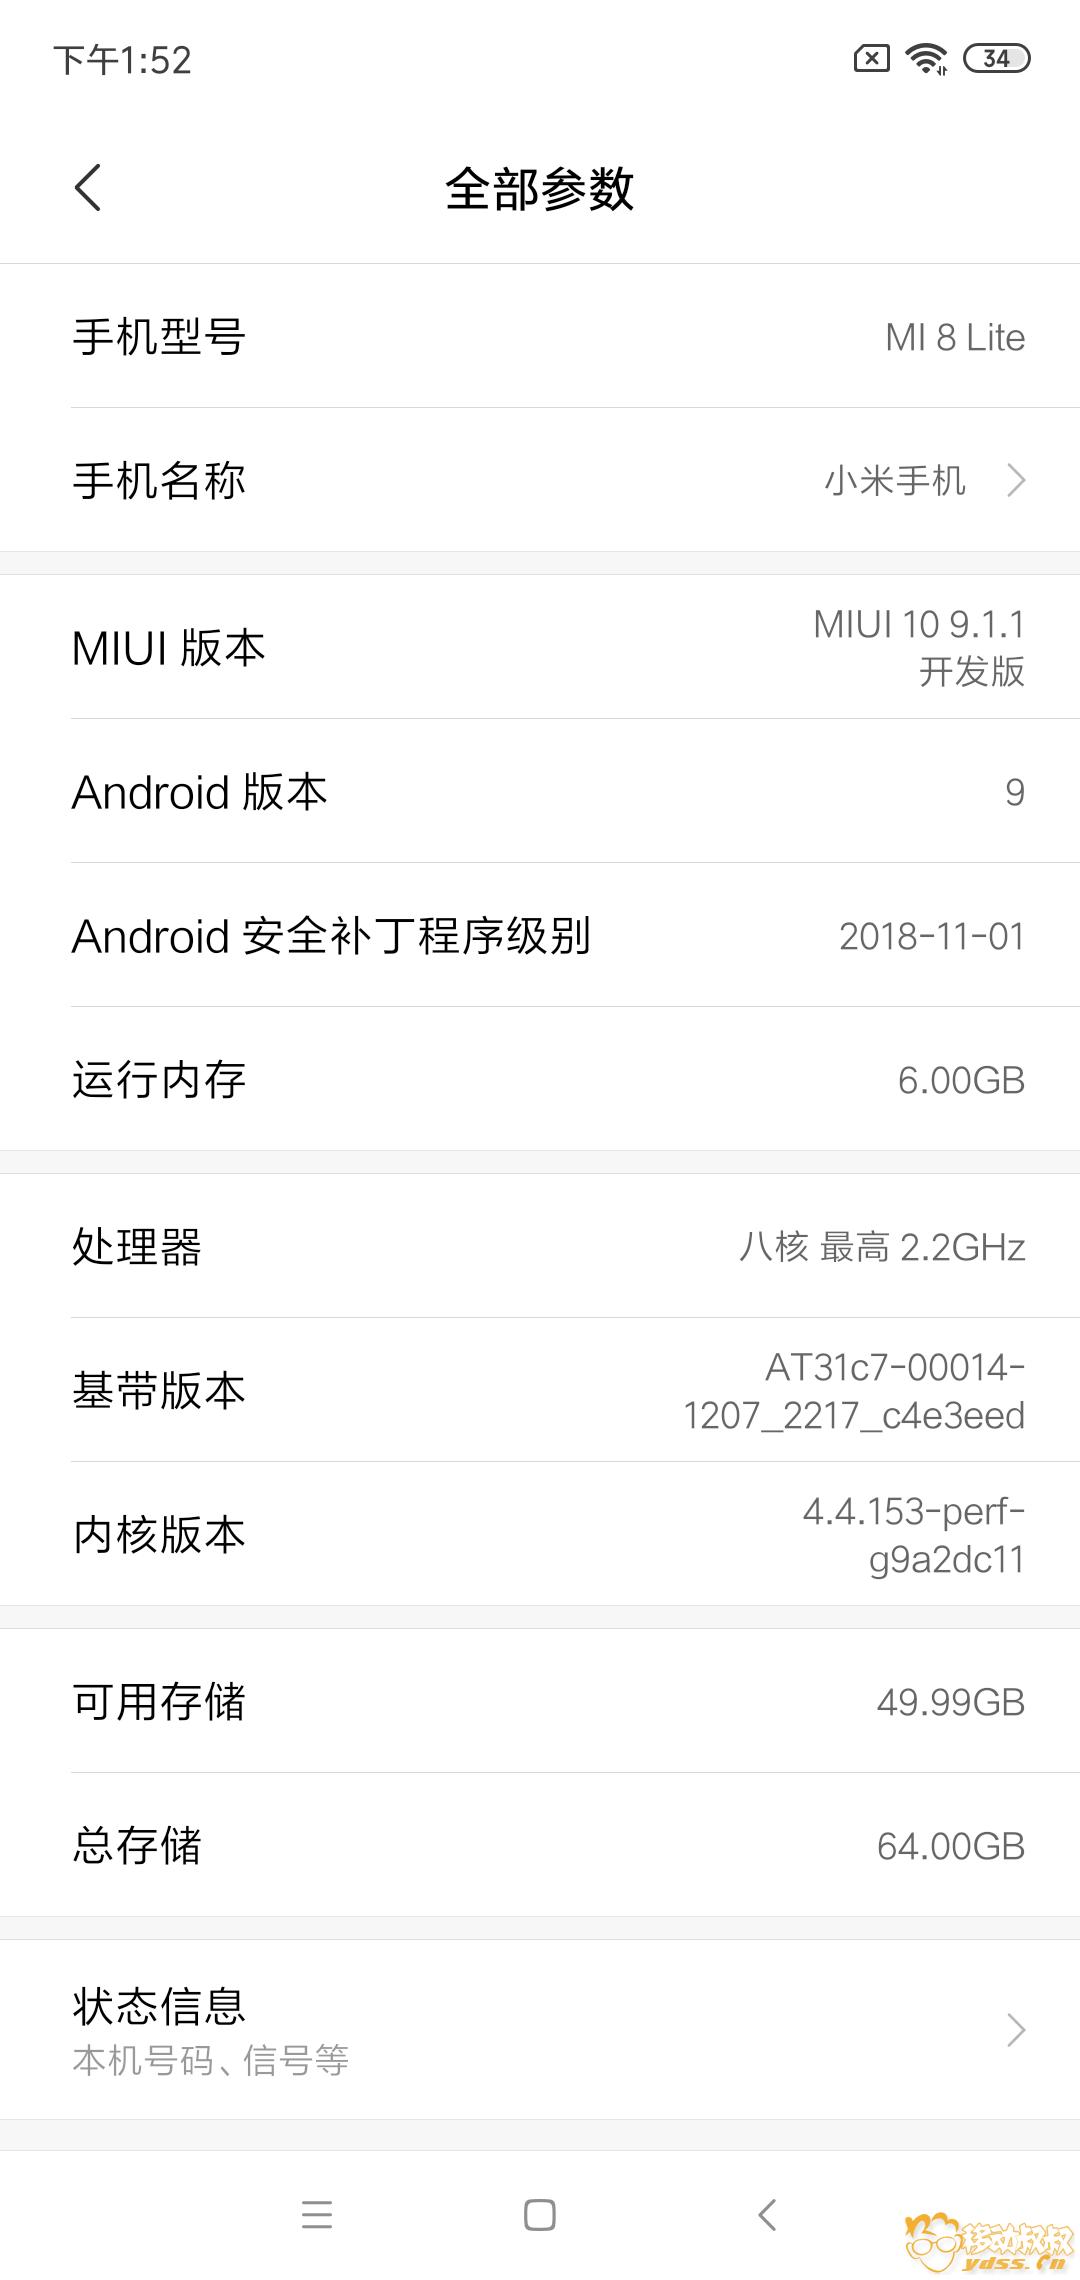 Screenshot_2019-01-01-13-52-01-783_com.android.settings.png